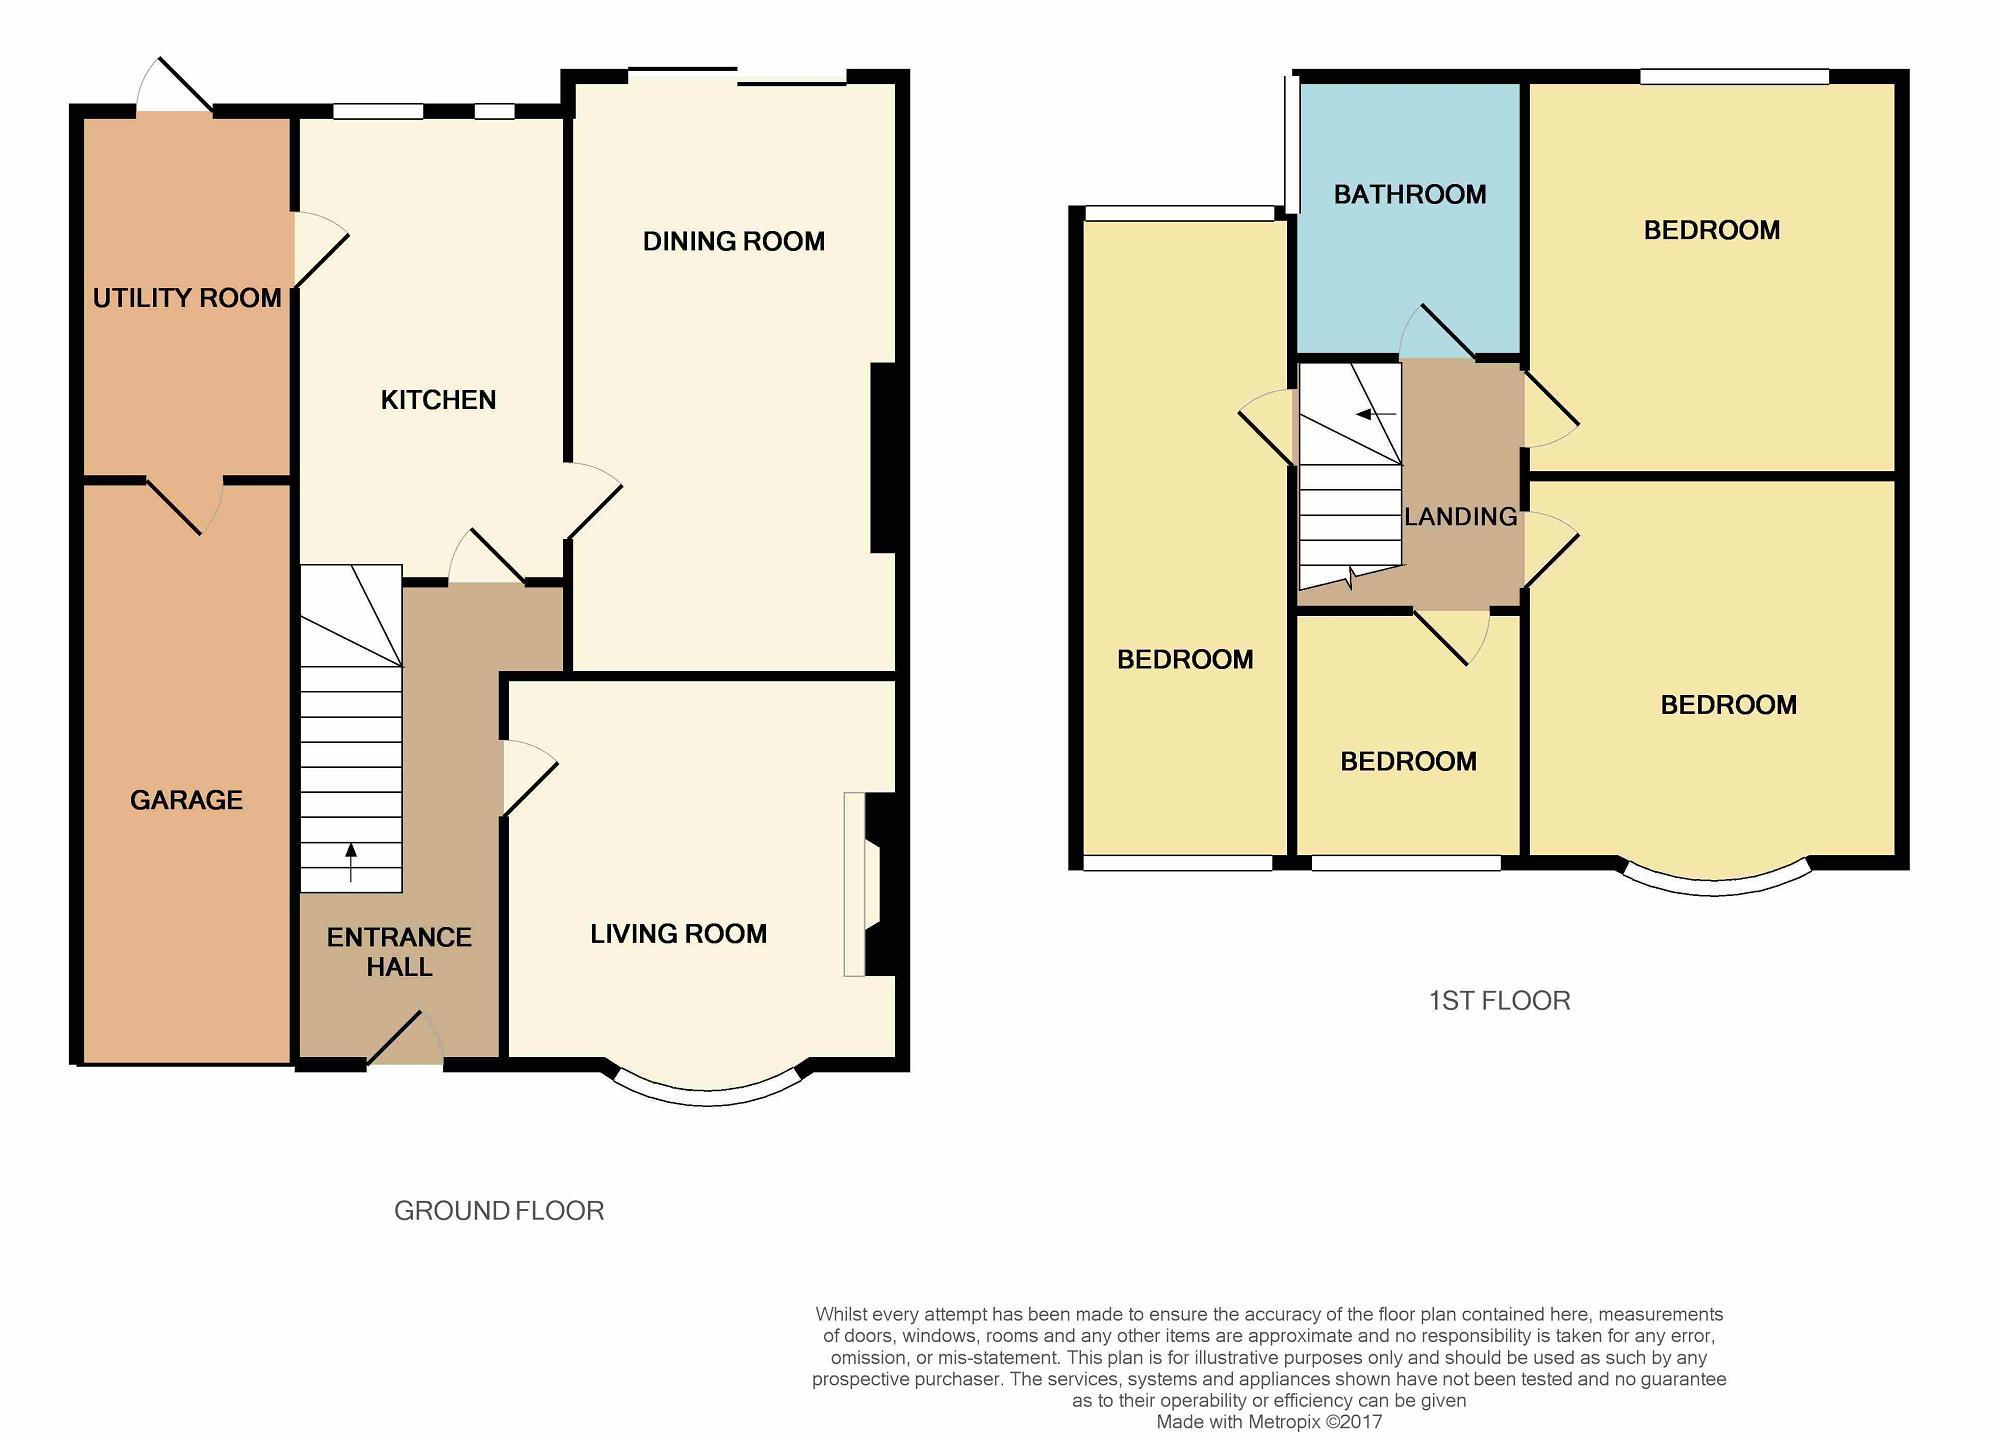 4 bedroom semi-detached for sale in grange road, fenham, newcastle